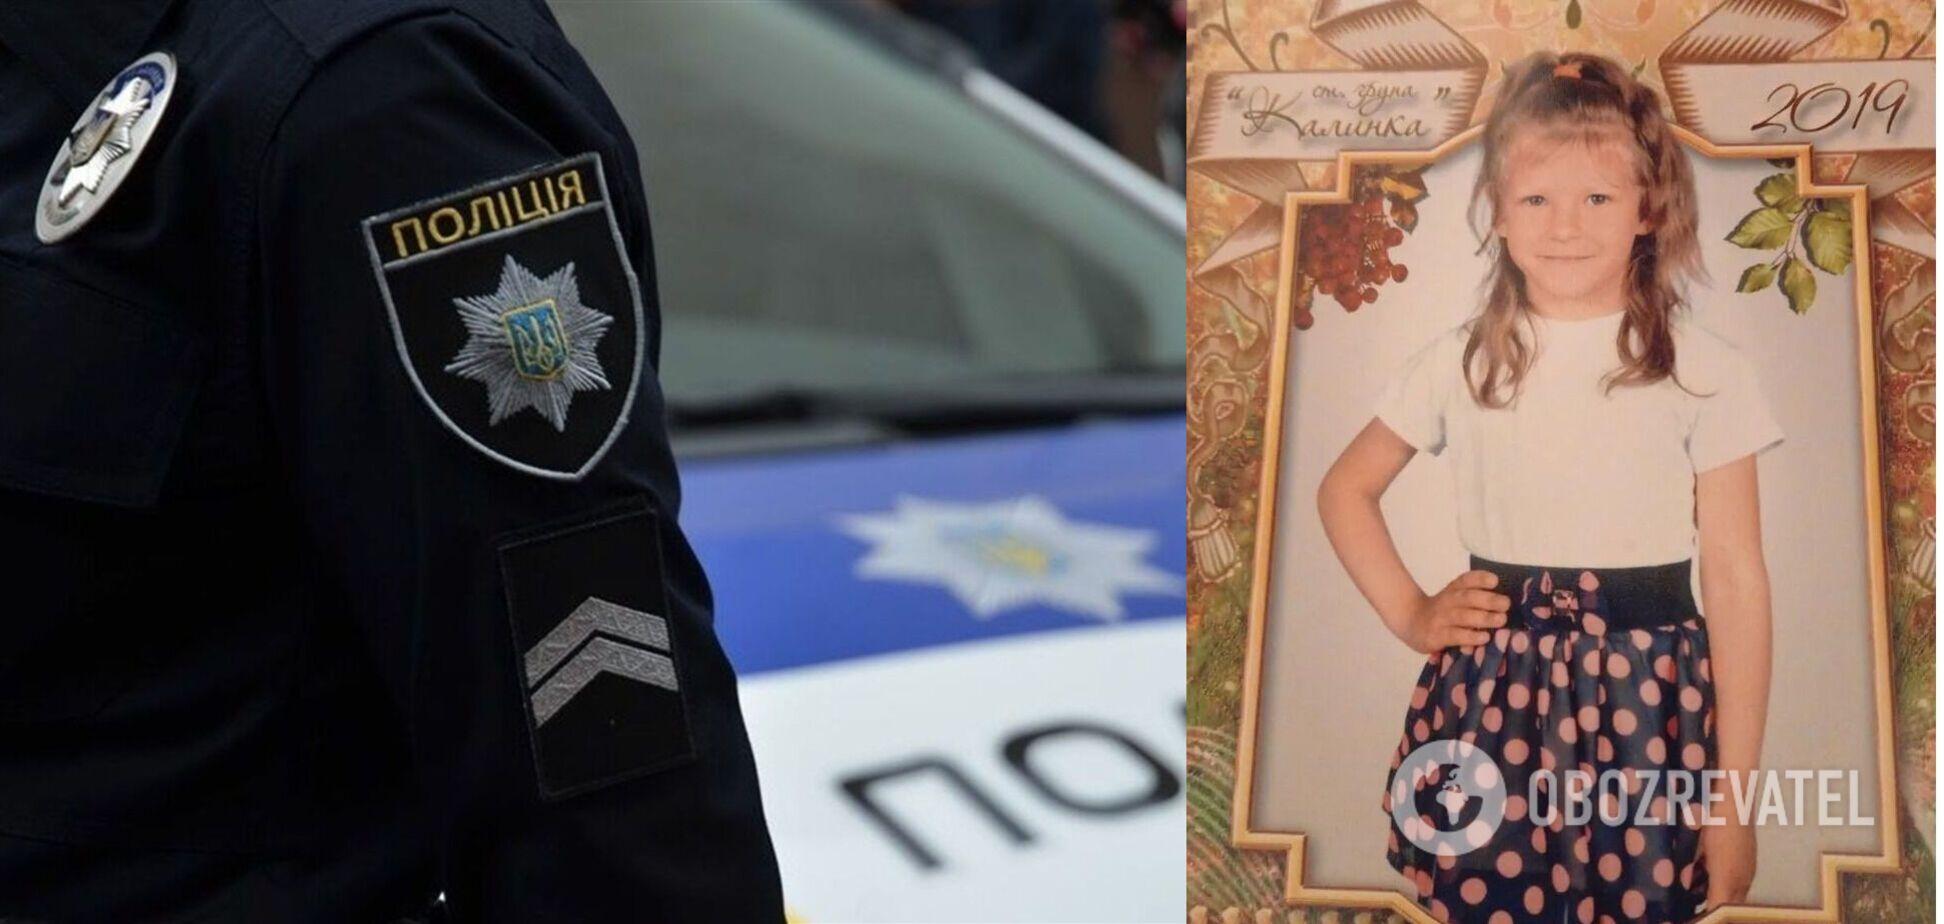 На Херсонщине нашли мертвой 7-летнюю Машу Борисову: все детали и фото